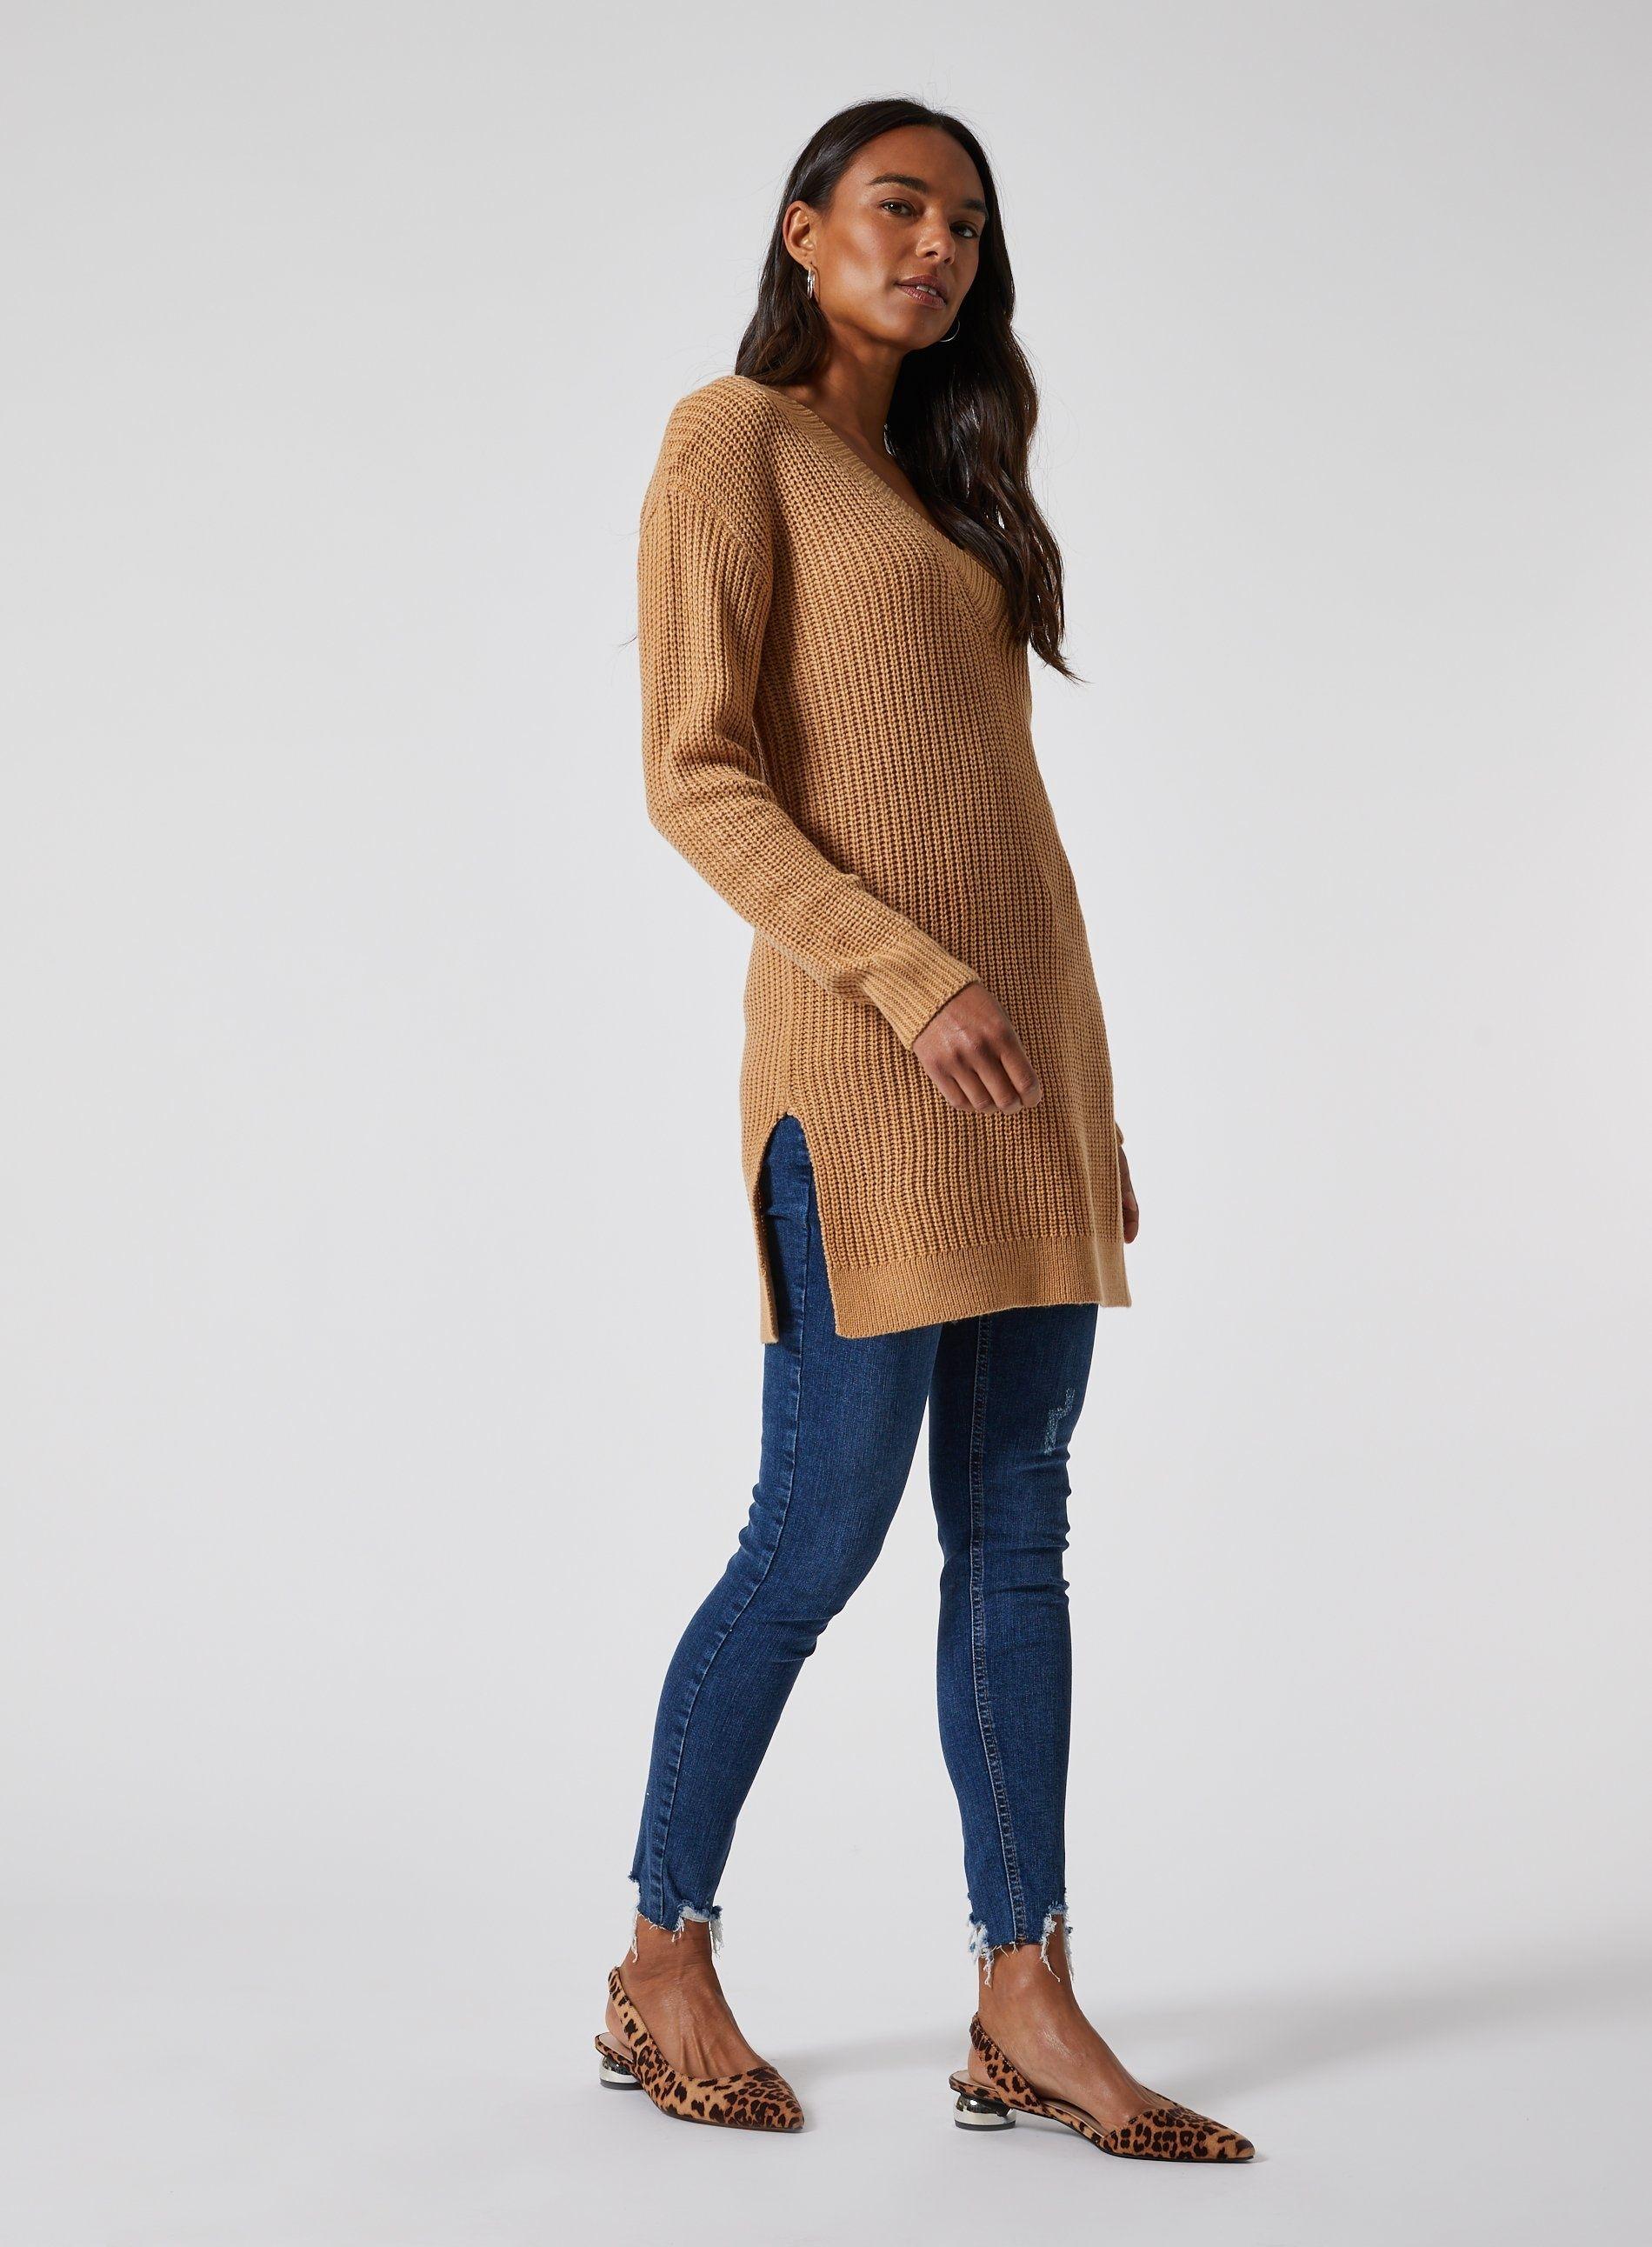 Dorothy Perkins Womens Camel V Neck Tunic Jumper Warm Sweater Pullover Knitwear